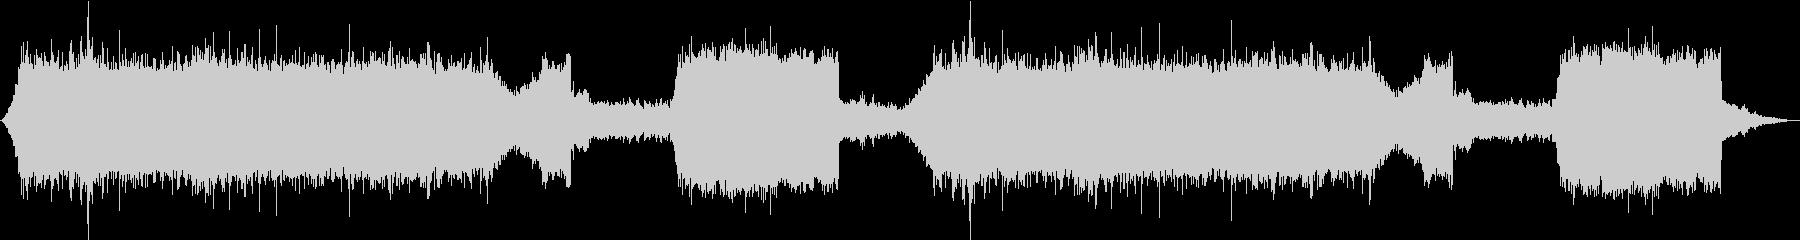 1/fゆらぎがたっぷりの自然音作品の未再生の波形